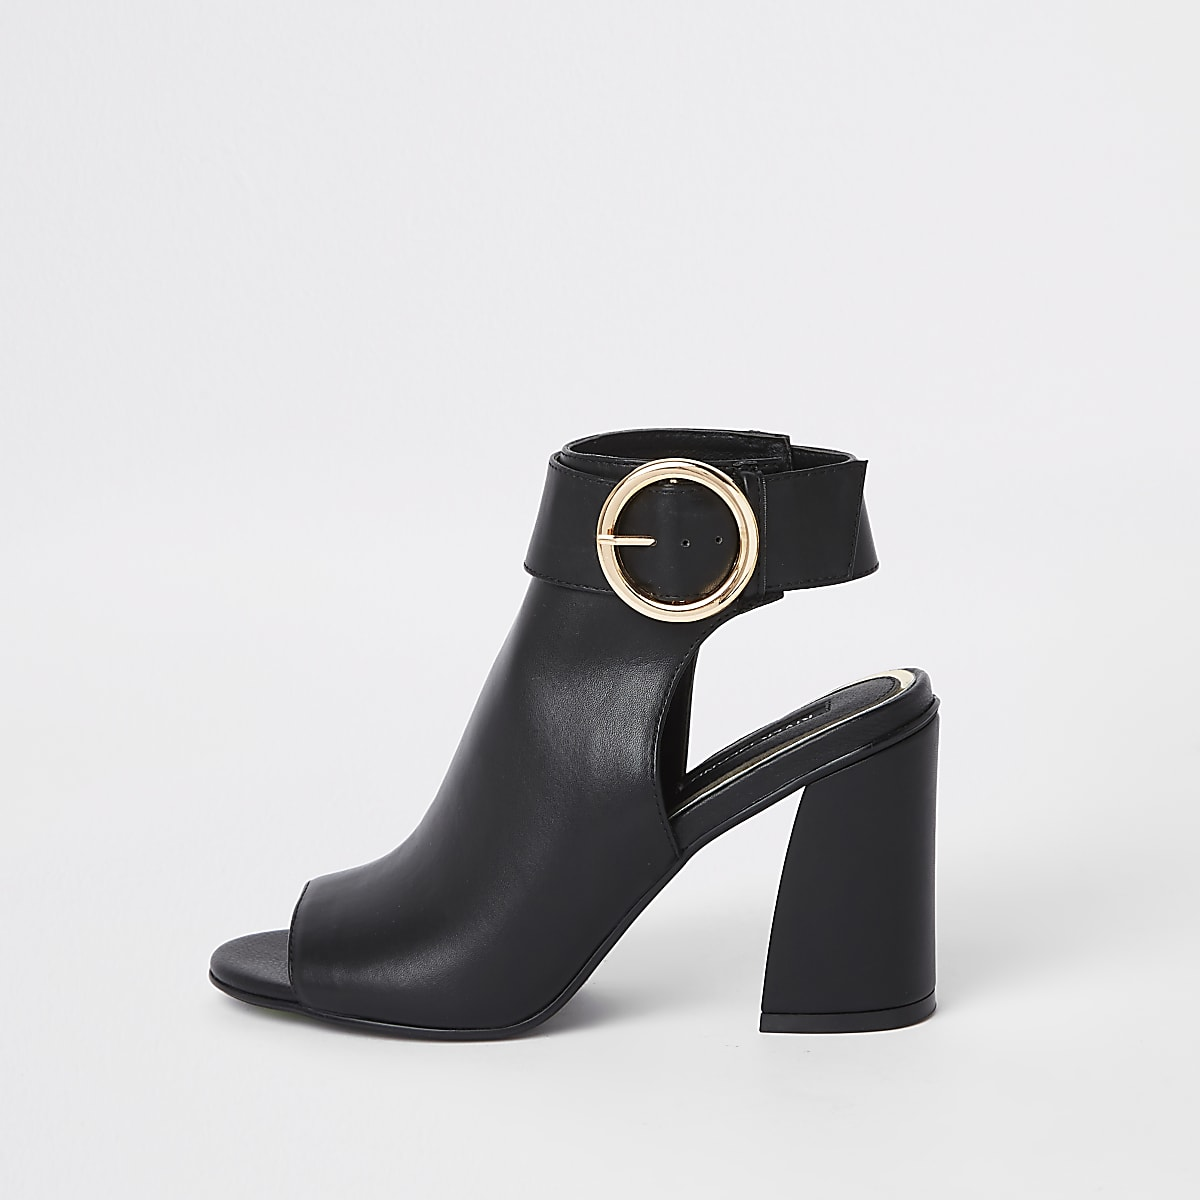 Black buckle strap ankle shoe boots